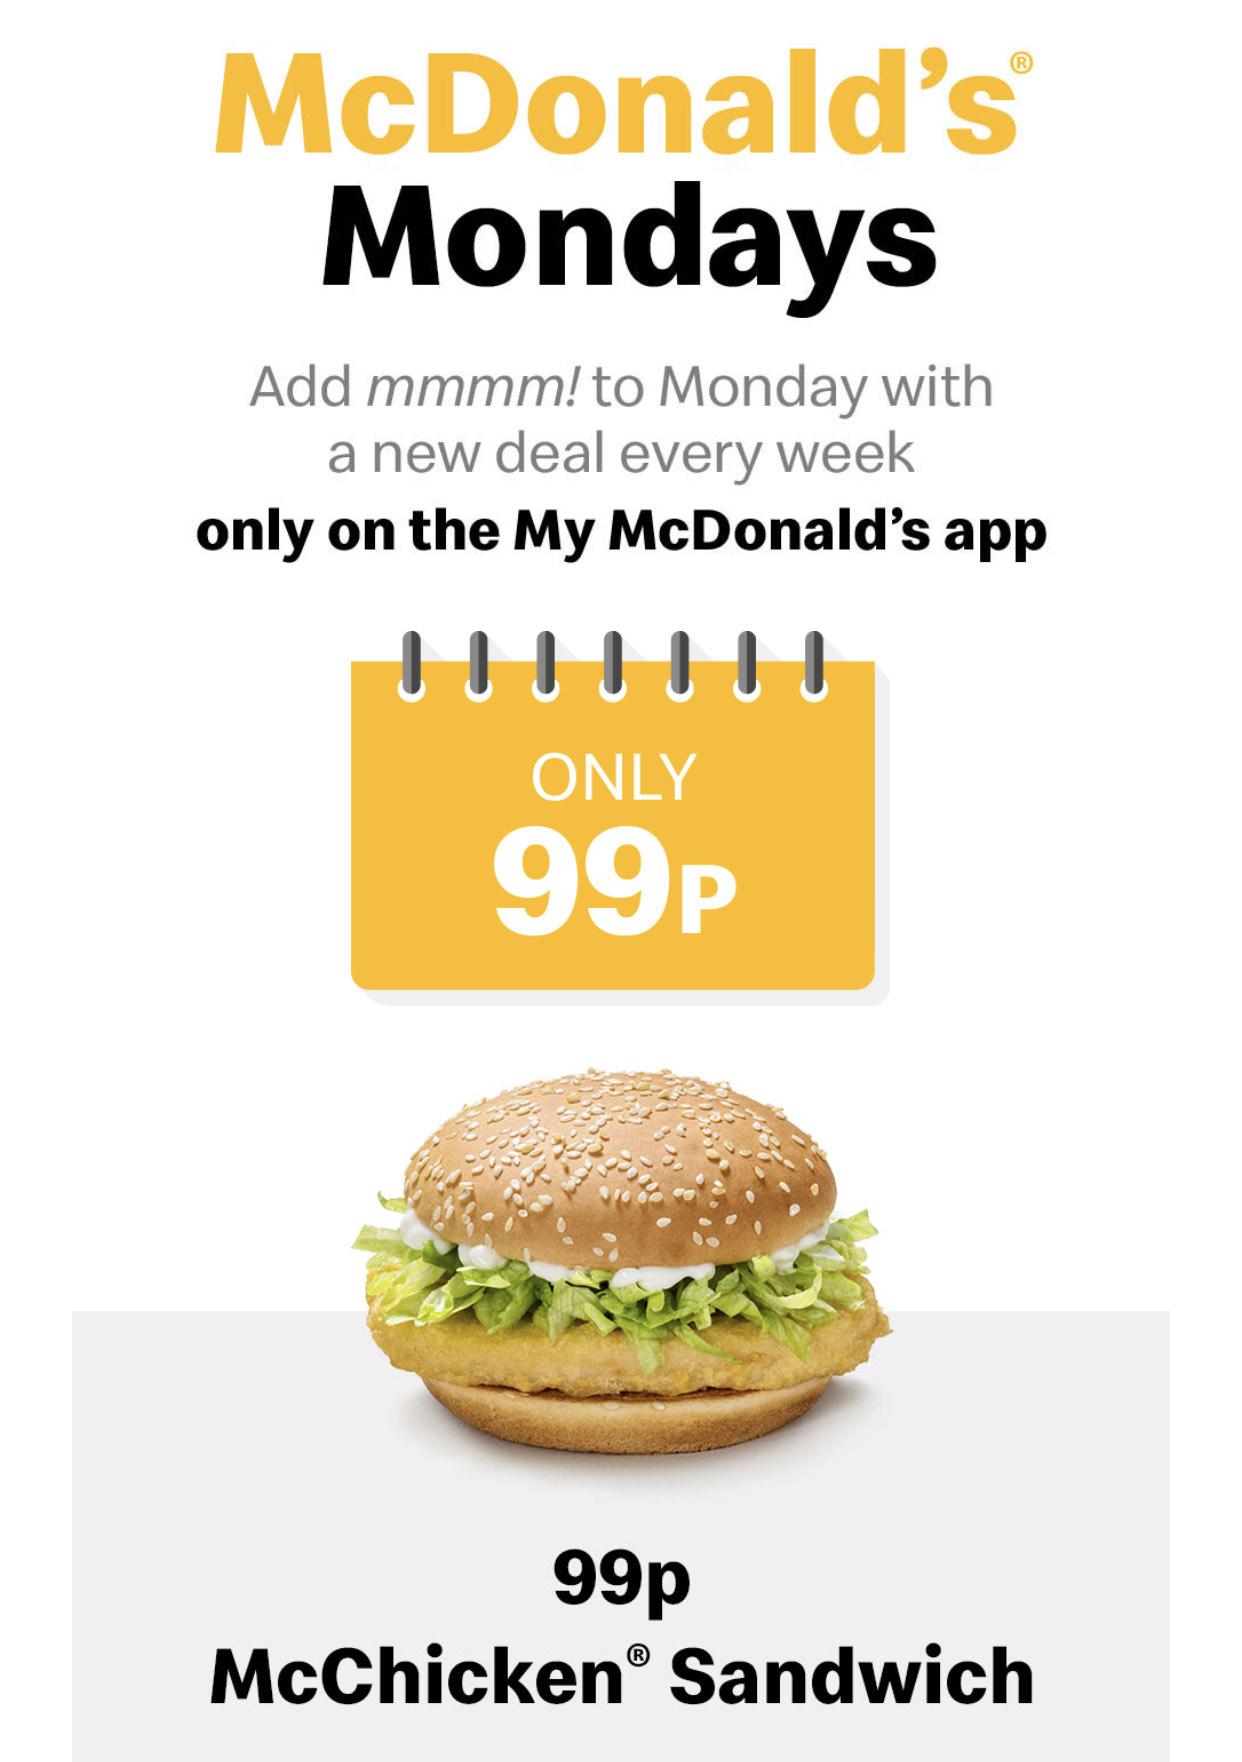 McChicken Sandwich 99p 4th Jan 2021 via App @ McDonalds